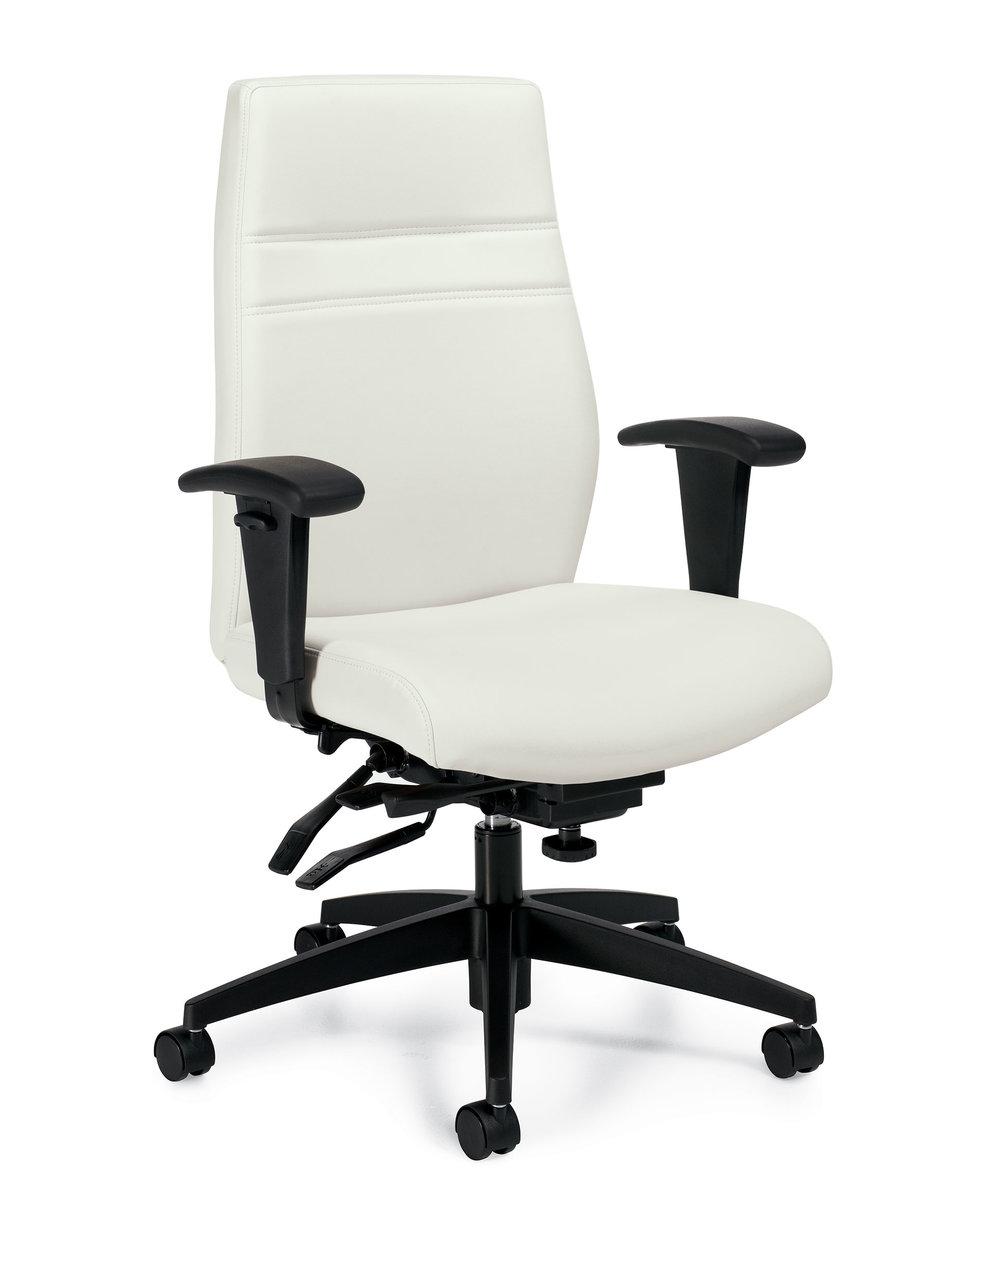 Executive Work Chair